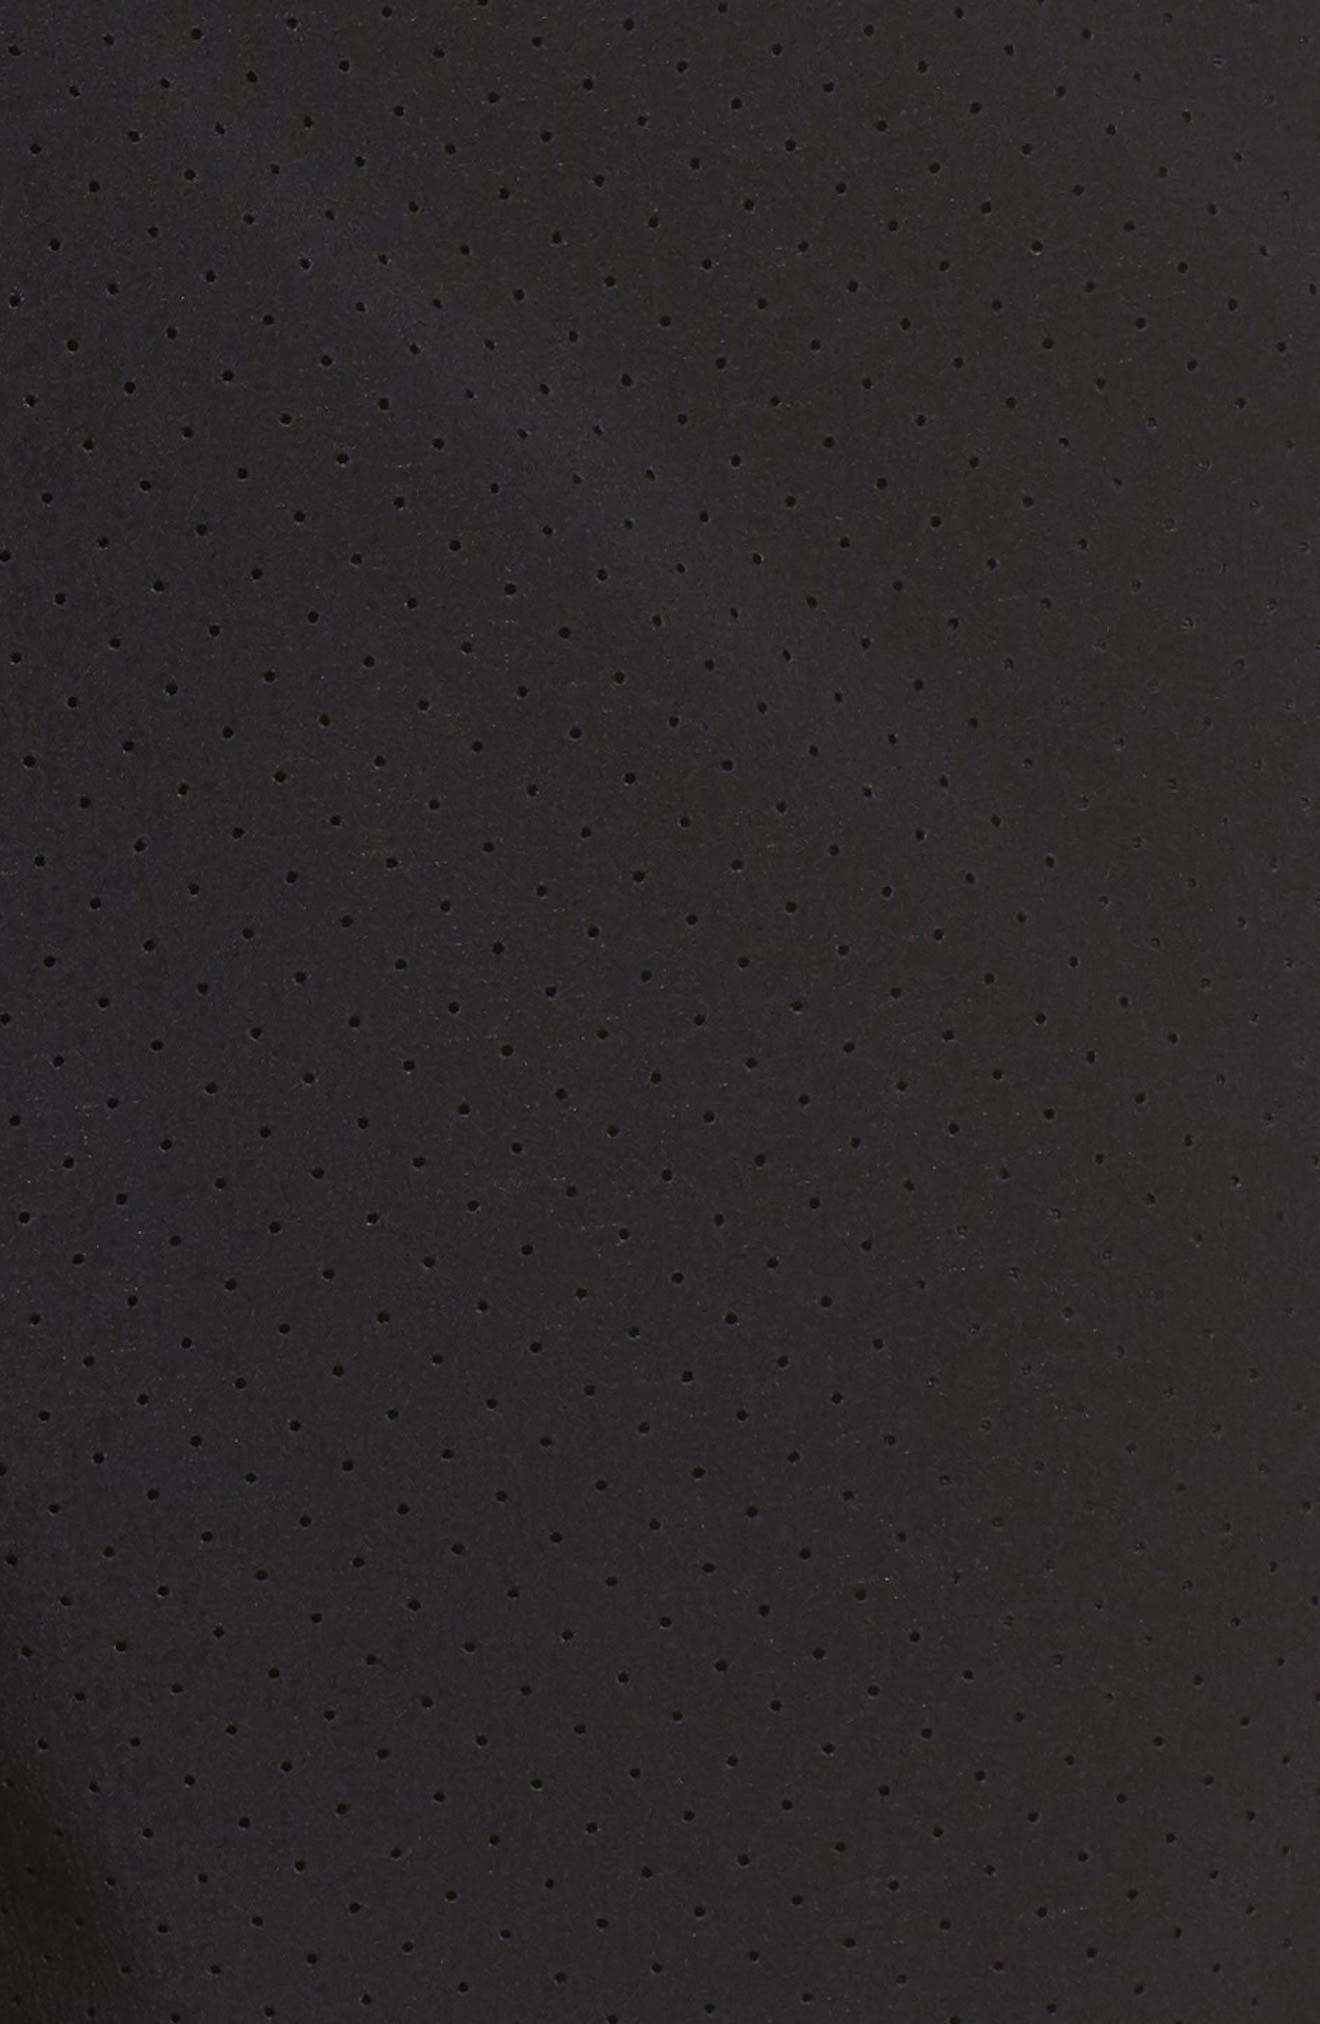 Breakaway 2-in-1 Shorts,                             Alternate thumbnail 3, color,                             Black